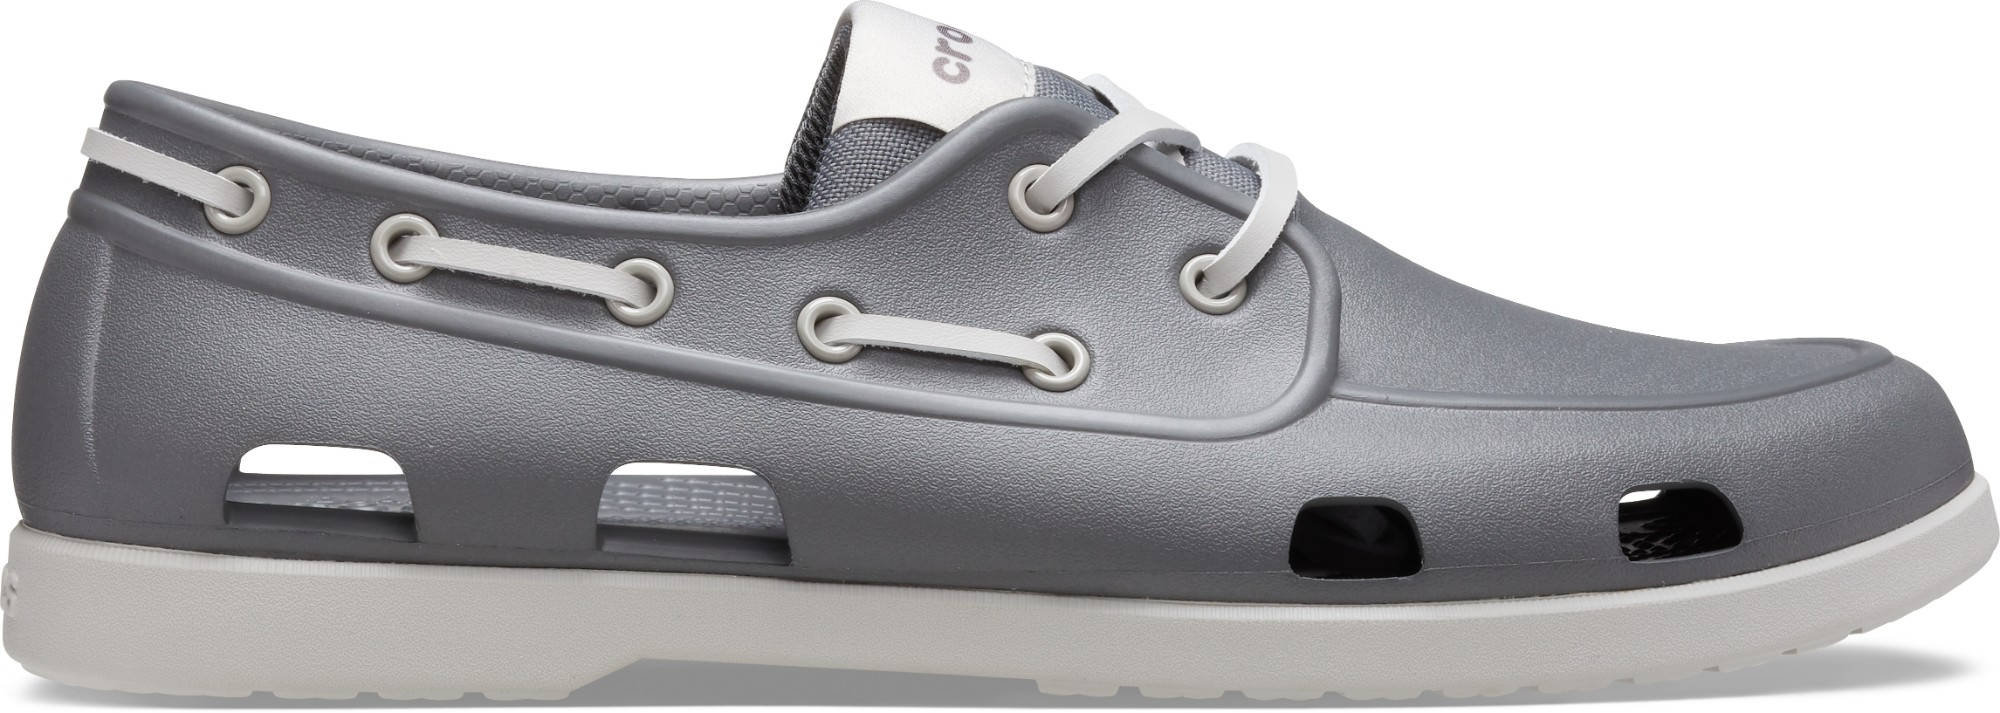 Crocs™ Classic Boat Shoe Mens Slate Grey/Pearl White 47,5